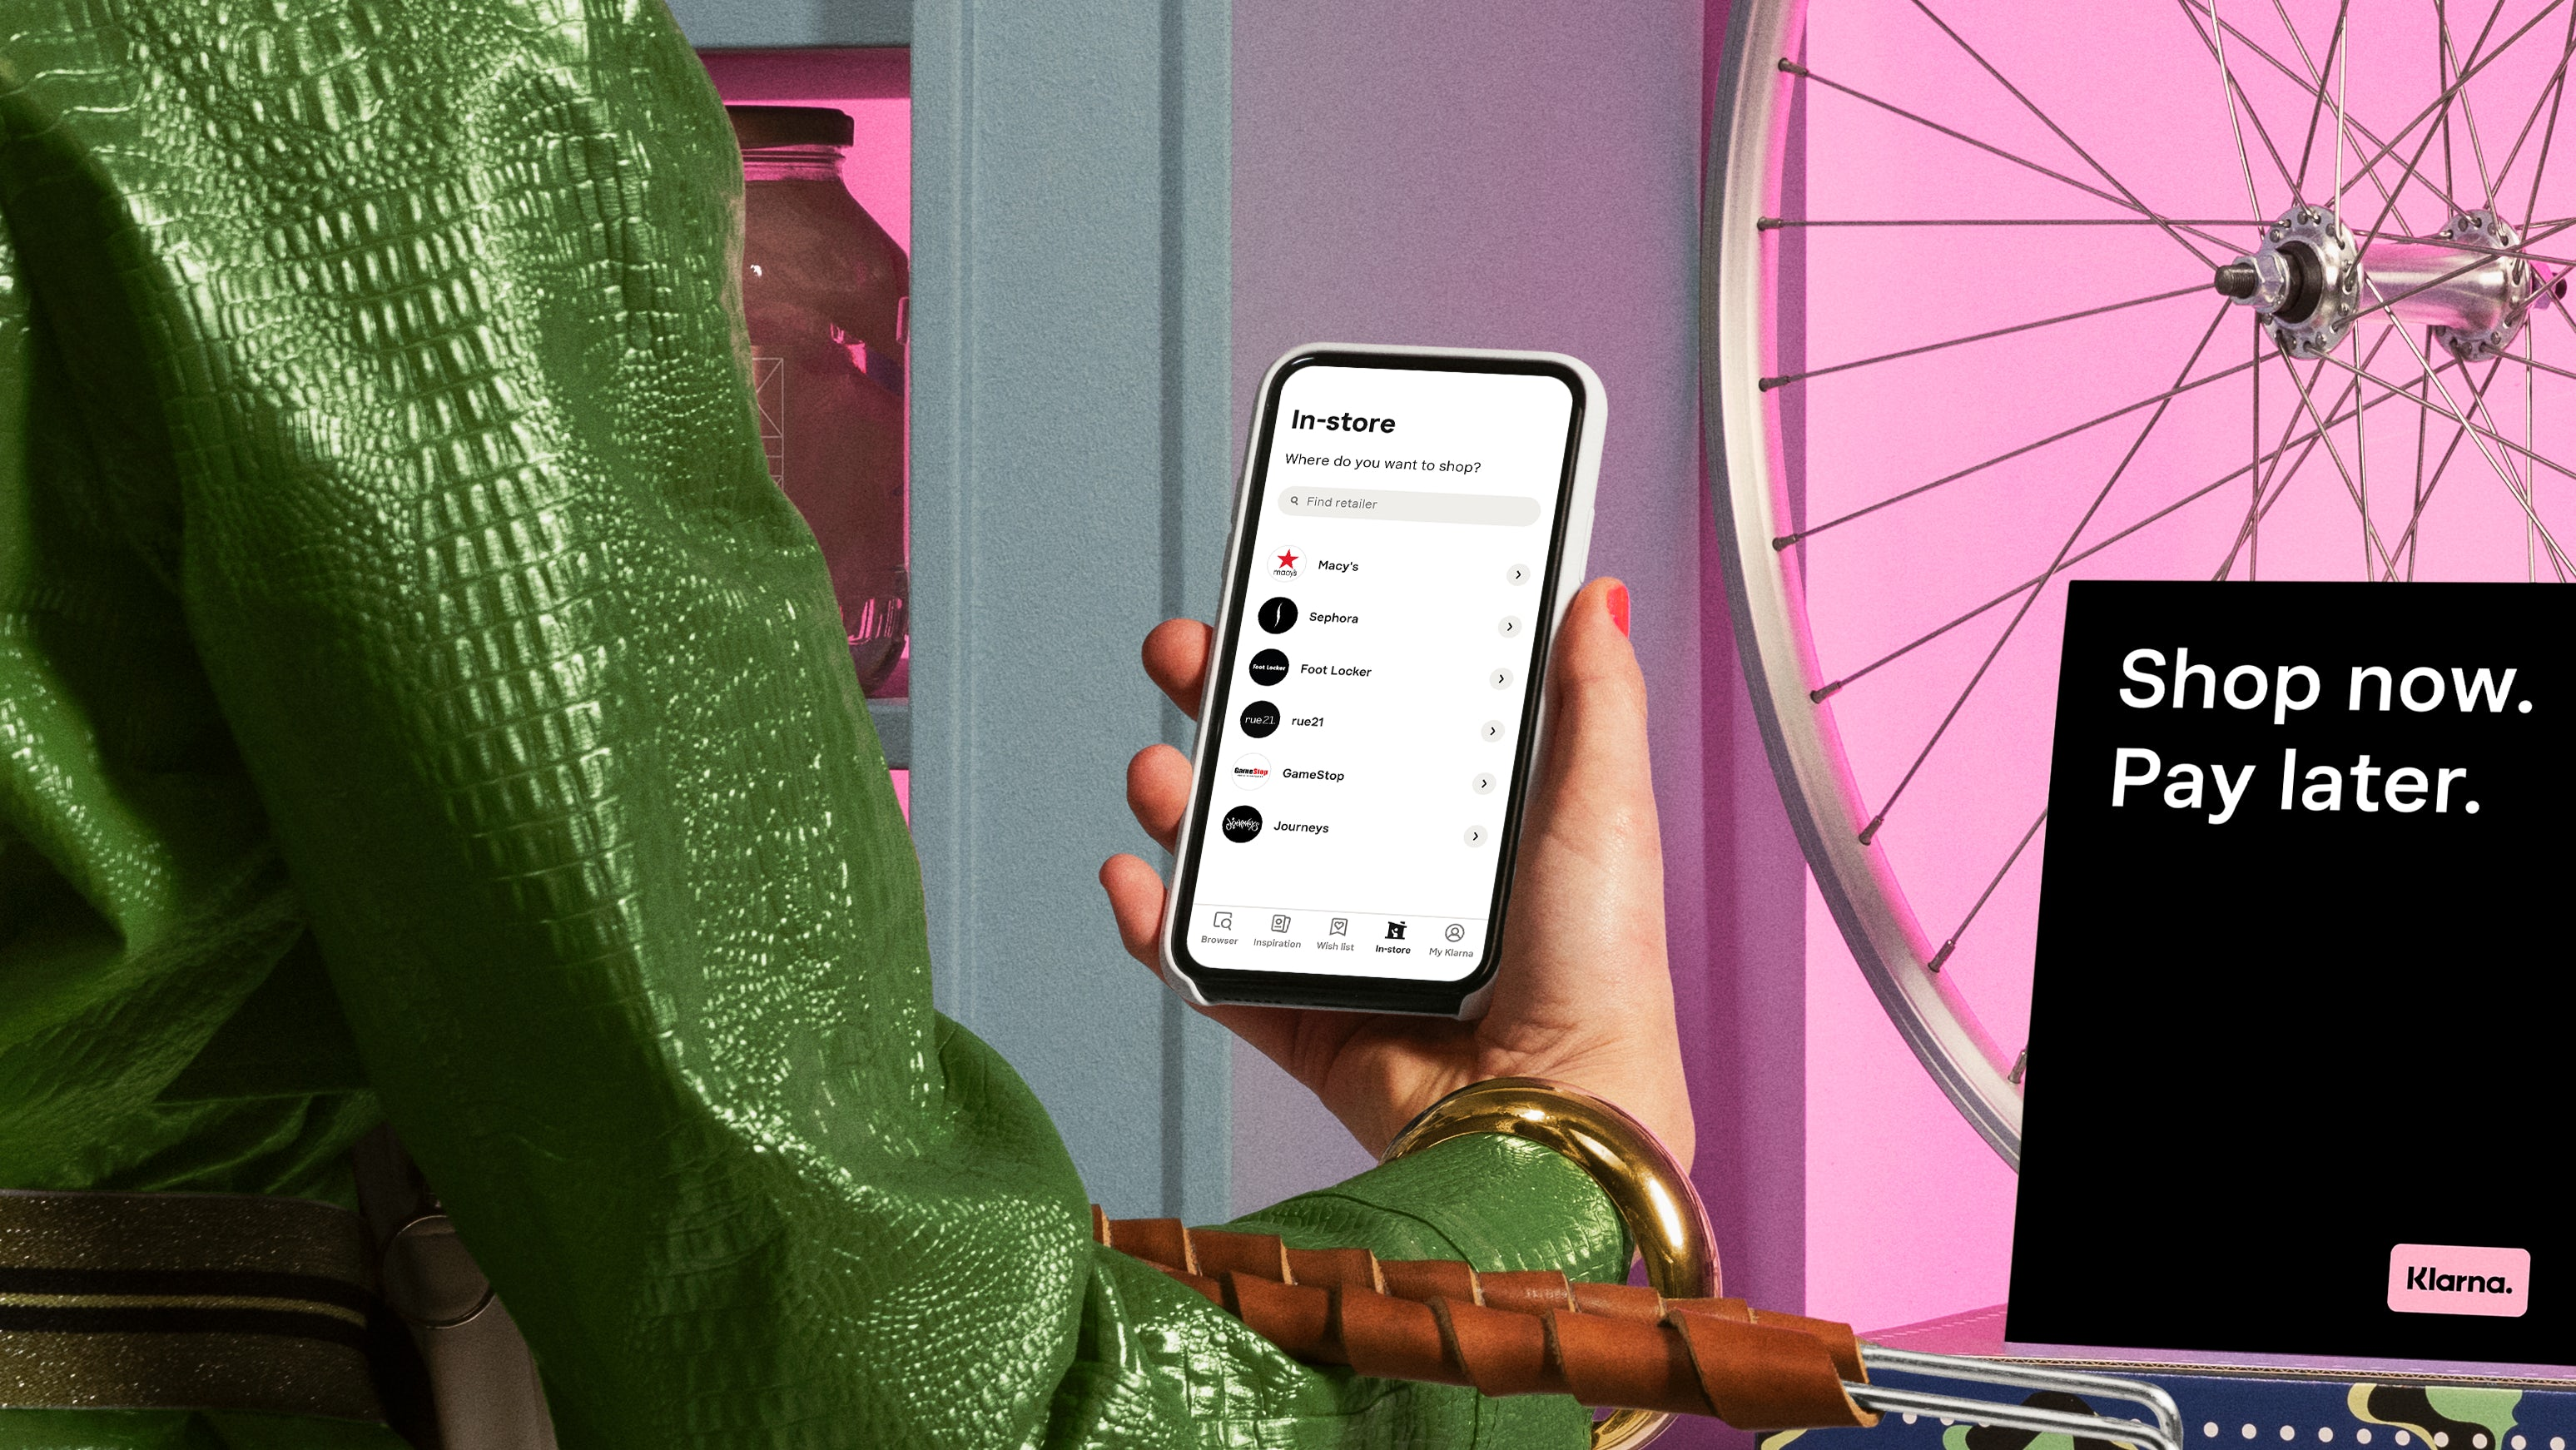 Klarna reported a record second quarter, growing gross merchandise value over 300 percent. Klarna.